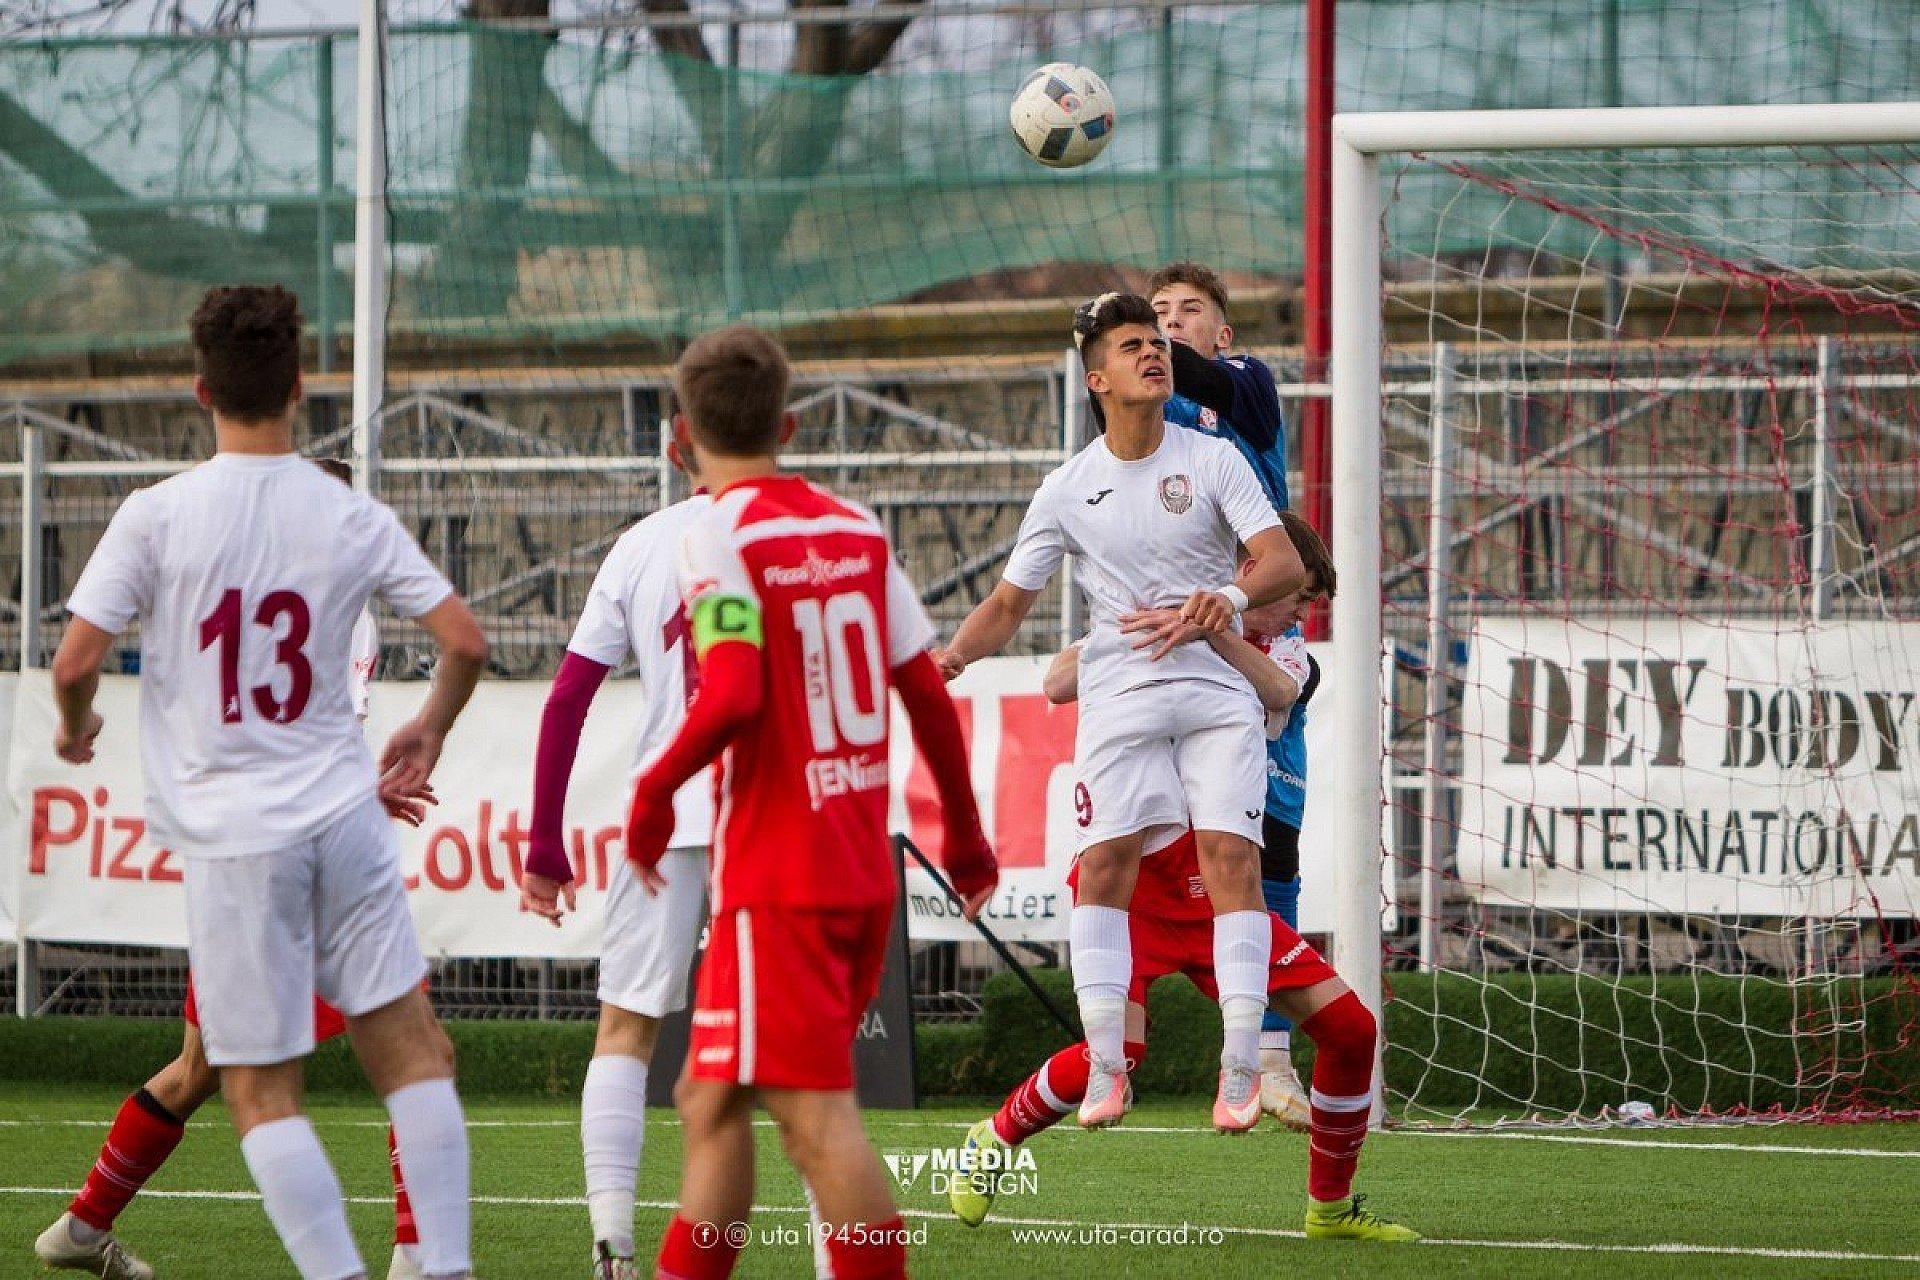 Imagine S-a reluat Liga Elitelor. Utiștii au avut meciuri la CFR Cluj